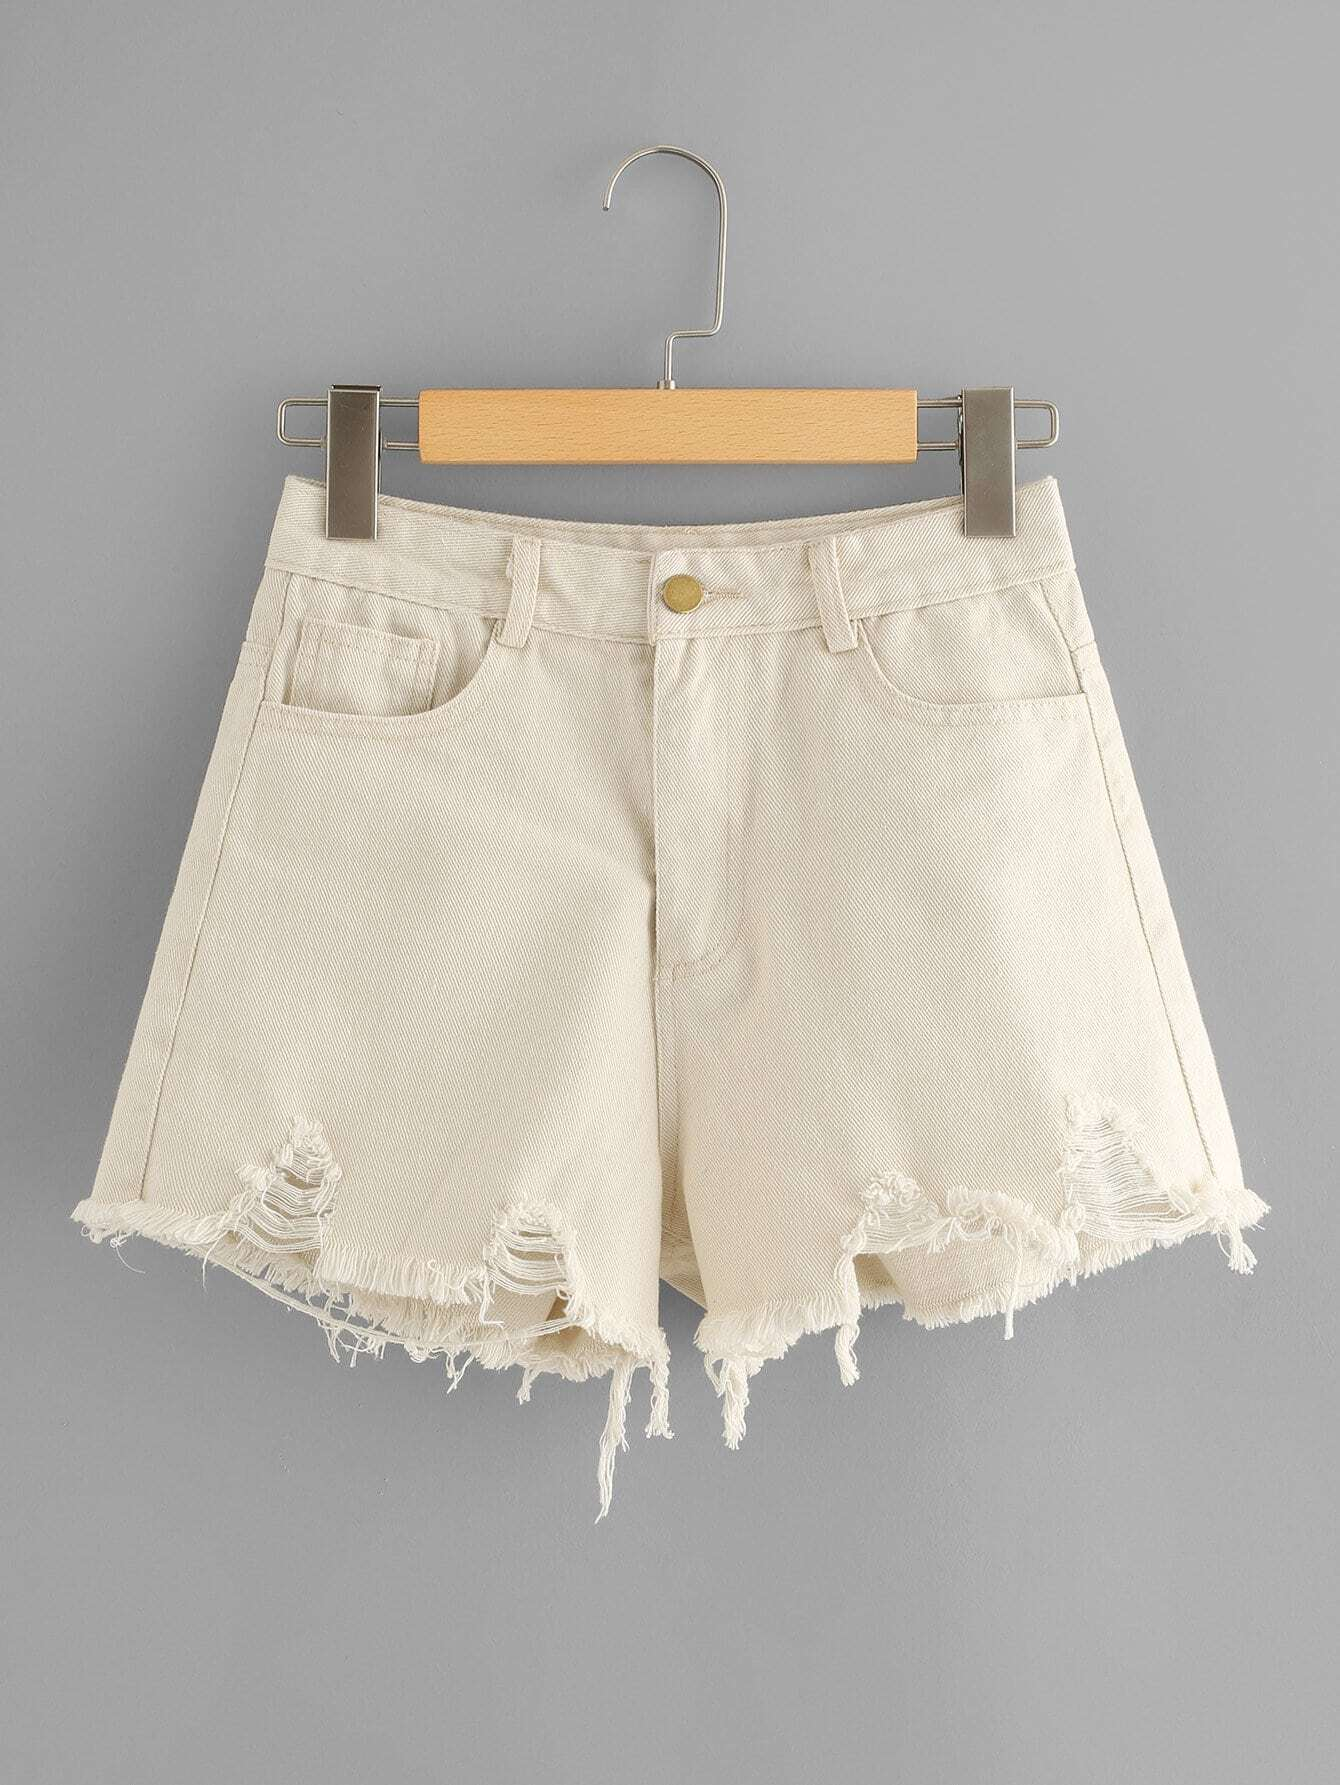 Frayed Hem Denim Shorts sweet wavy hem design striped shorts for women